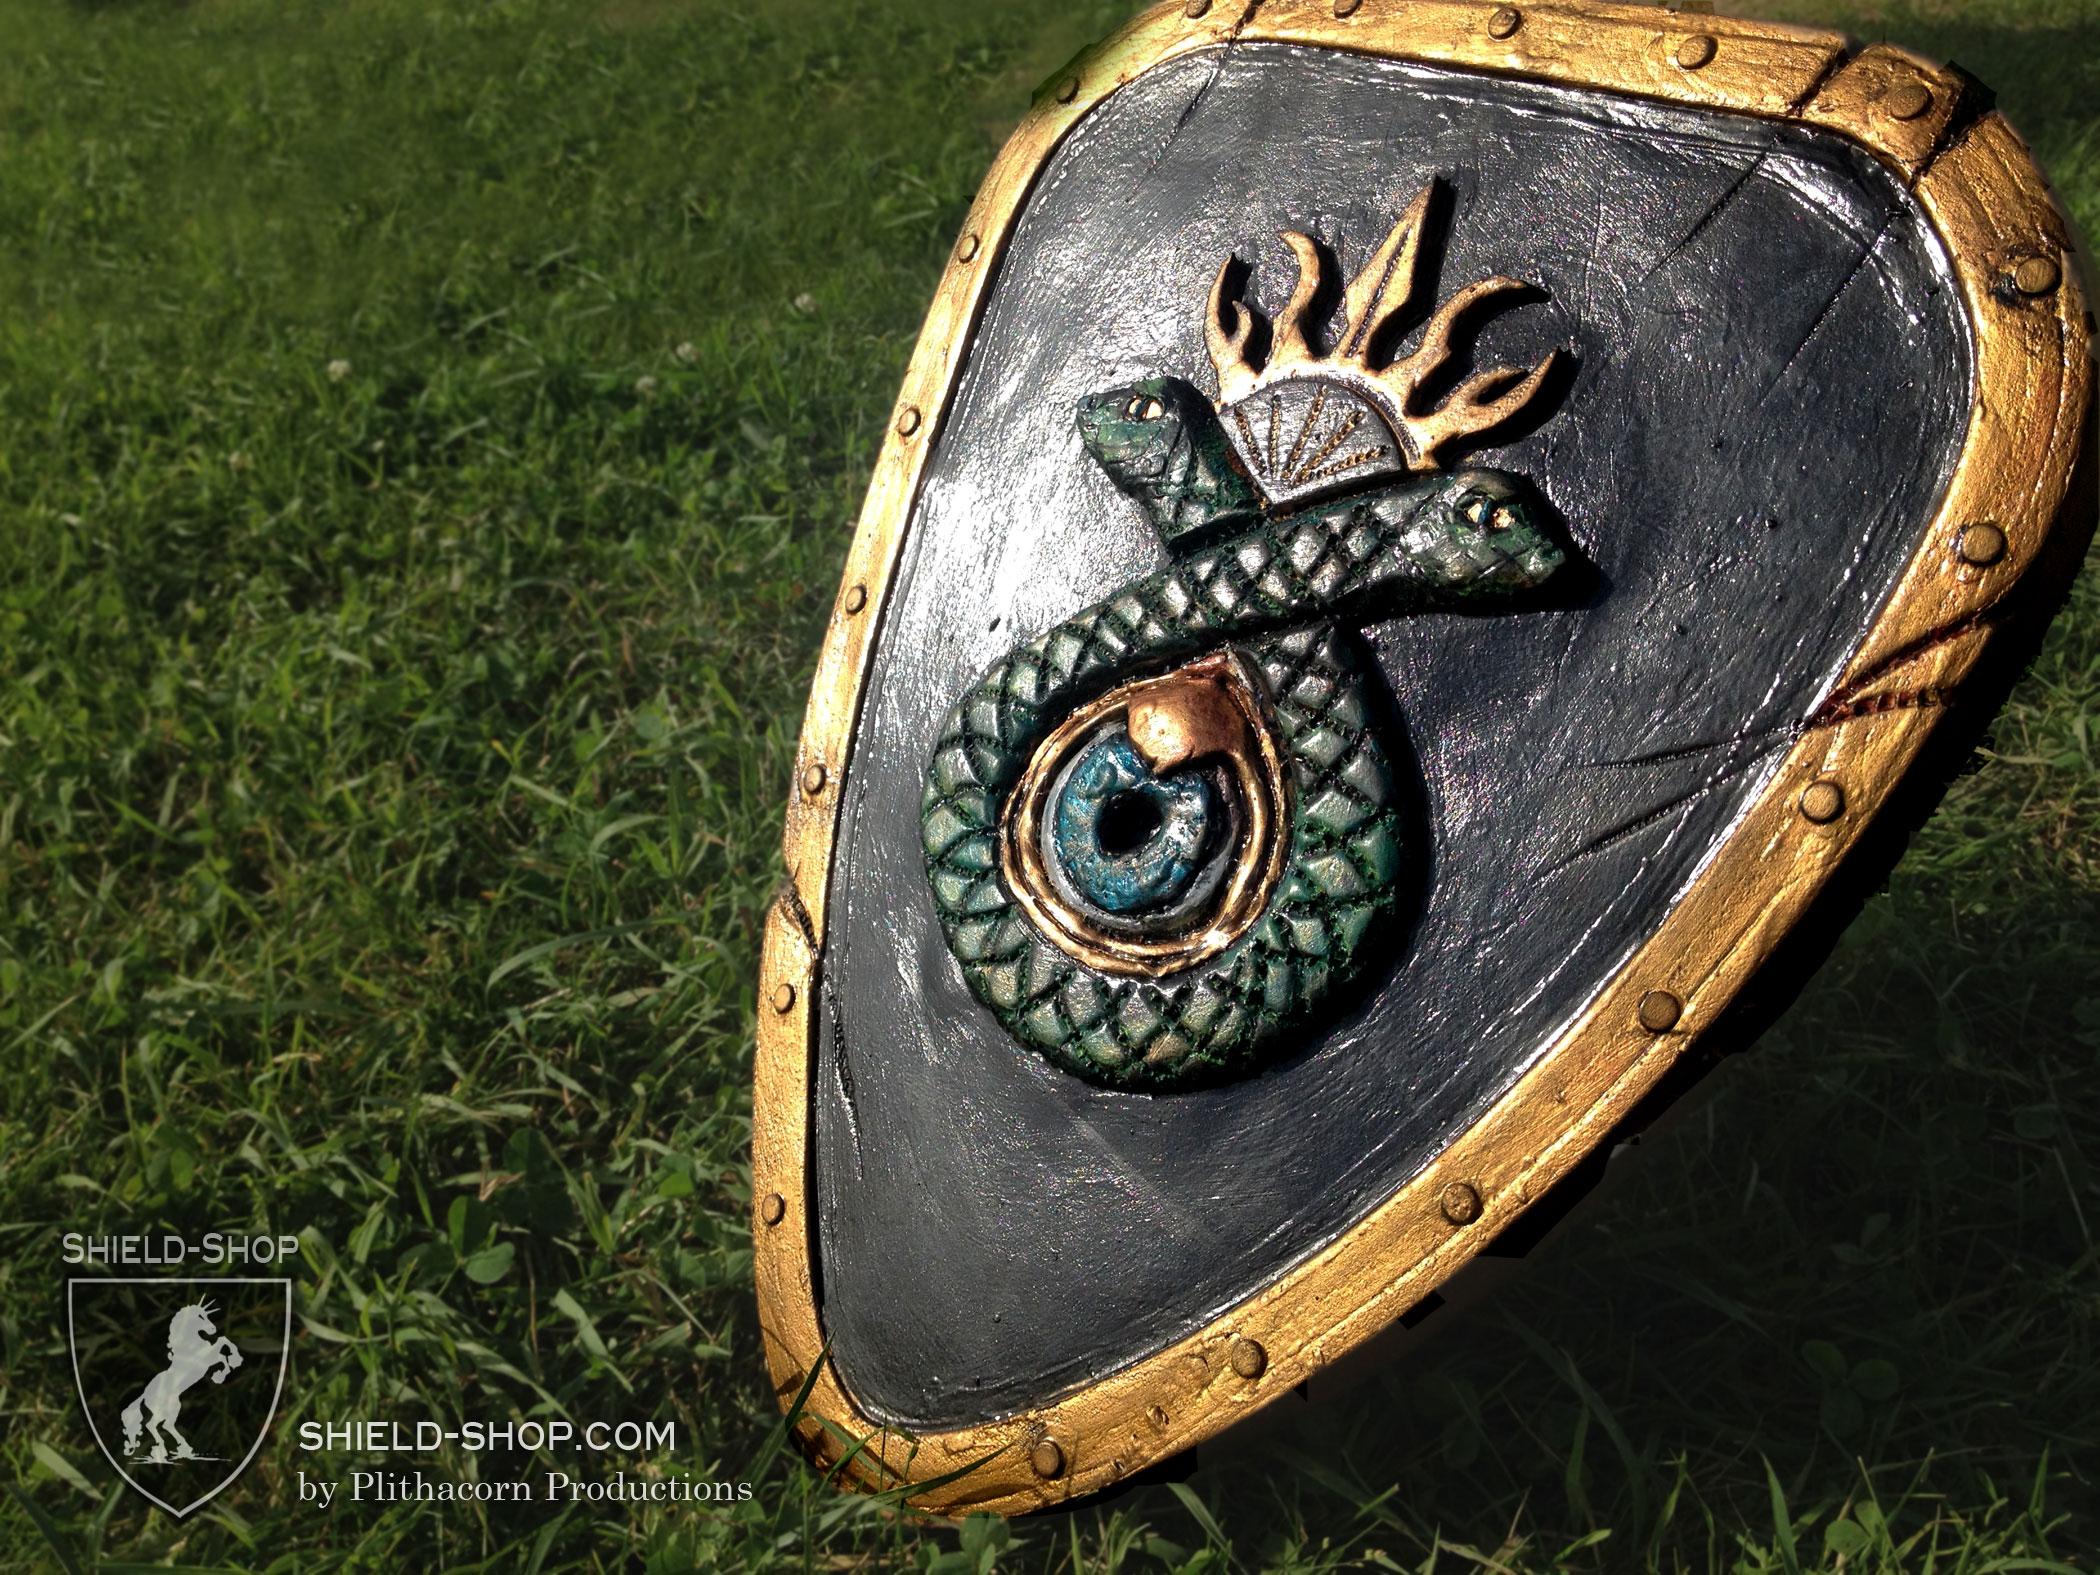 Complex Sculpture Shield Shop